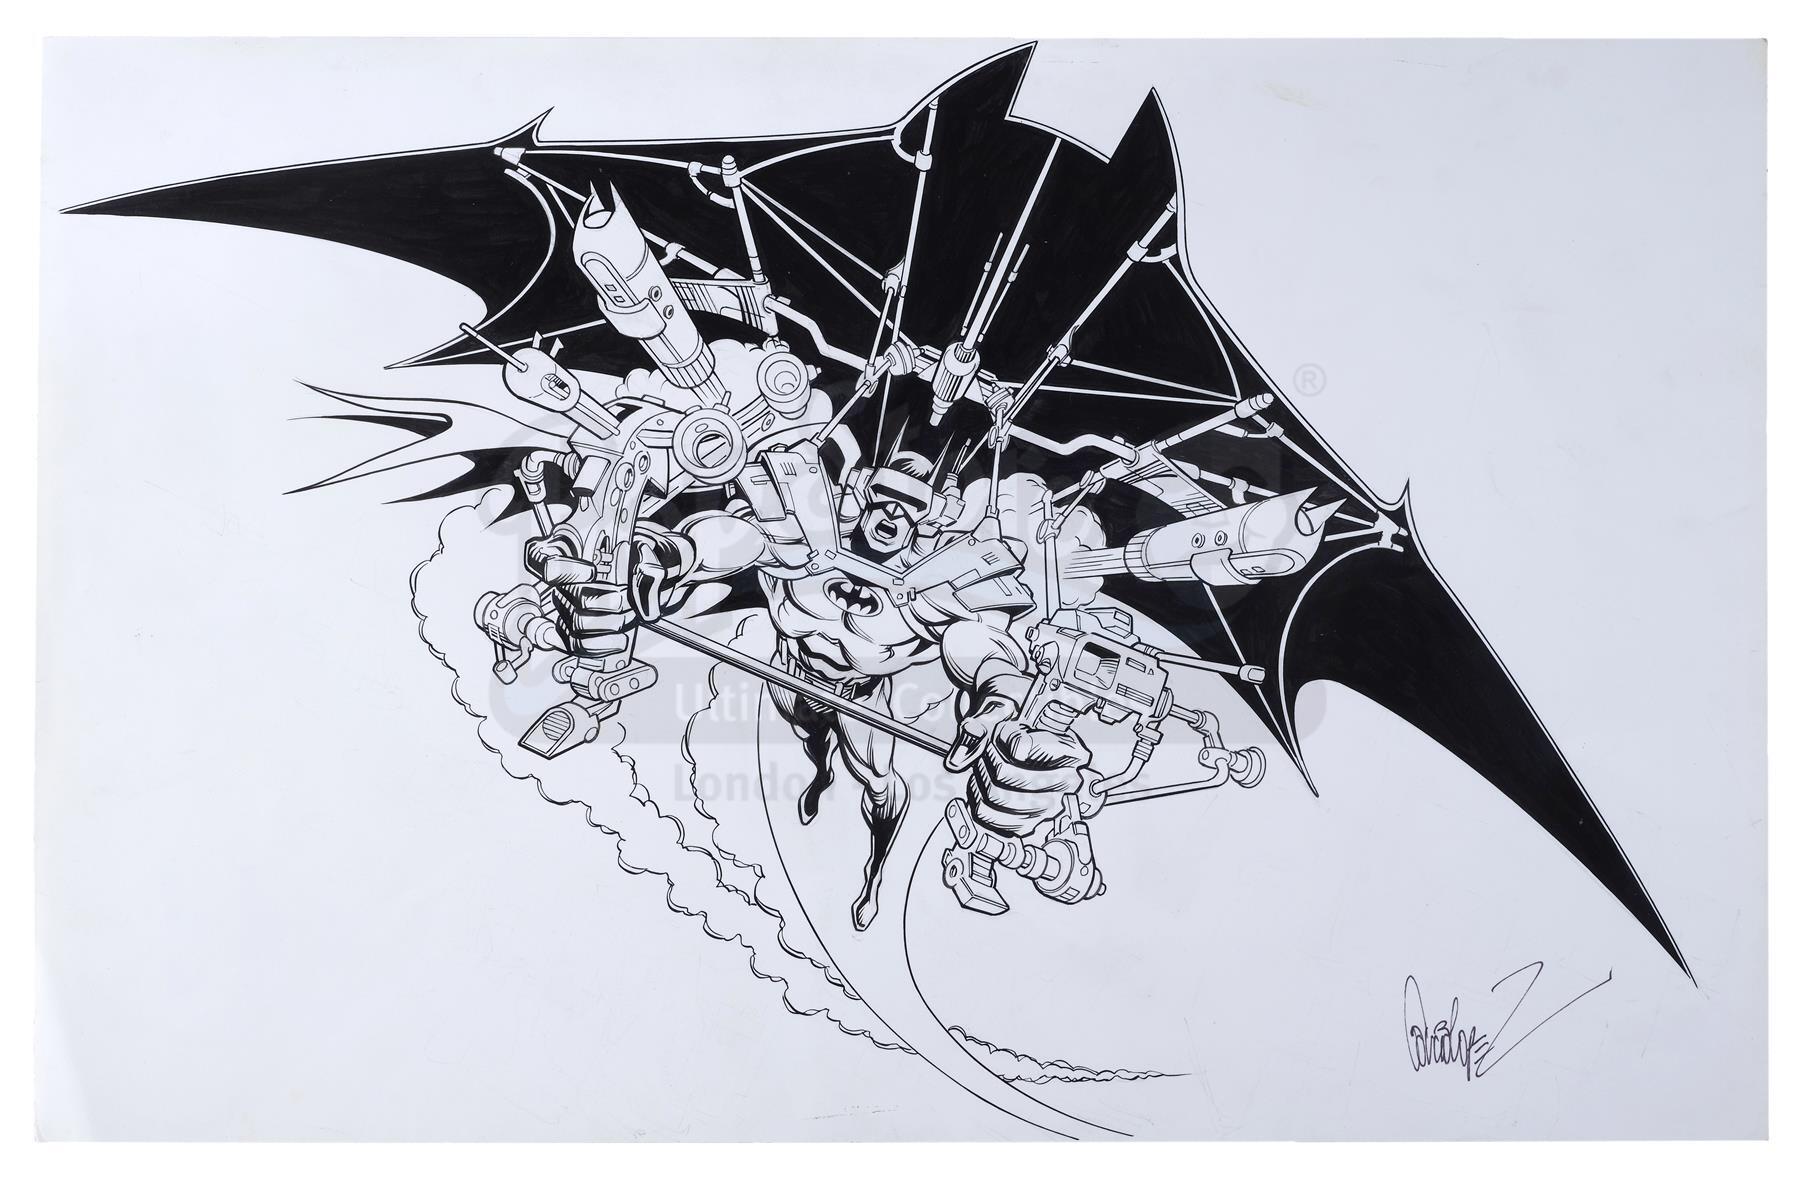 Lot # 514: B.A.T. - Hand-Drawn Jose Luis Garcia-Lopez-Signed Batglider Illustration